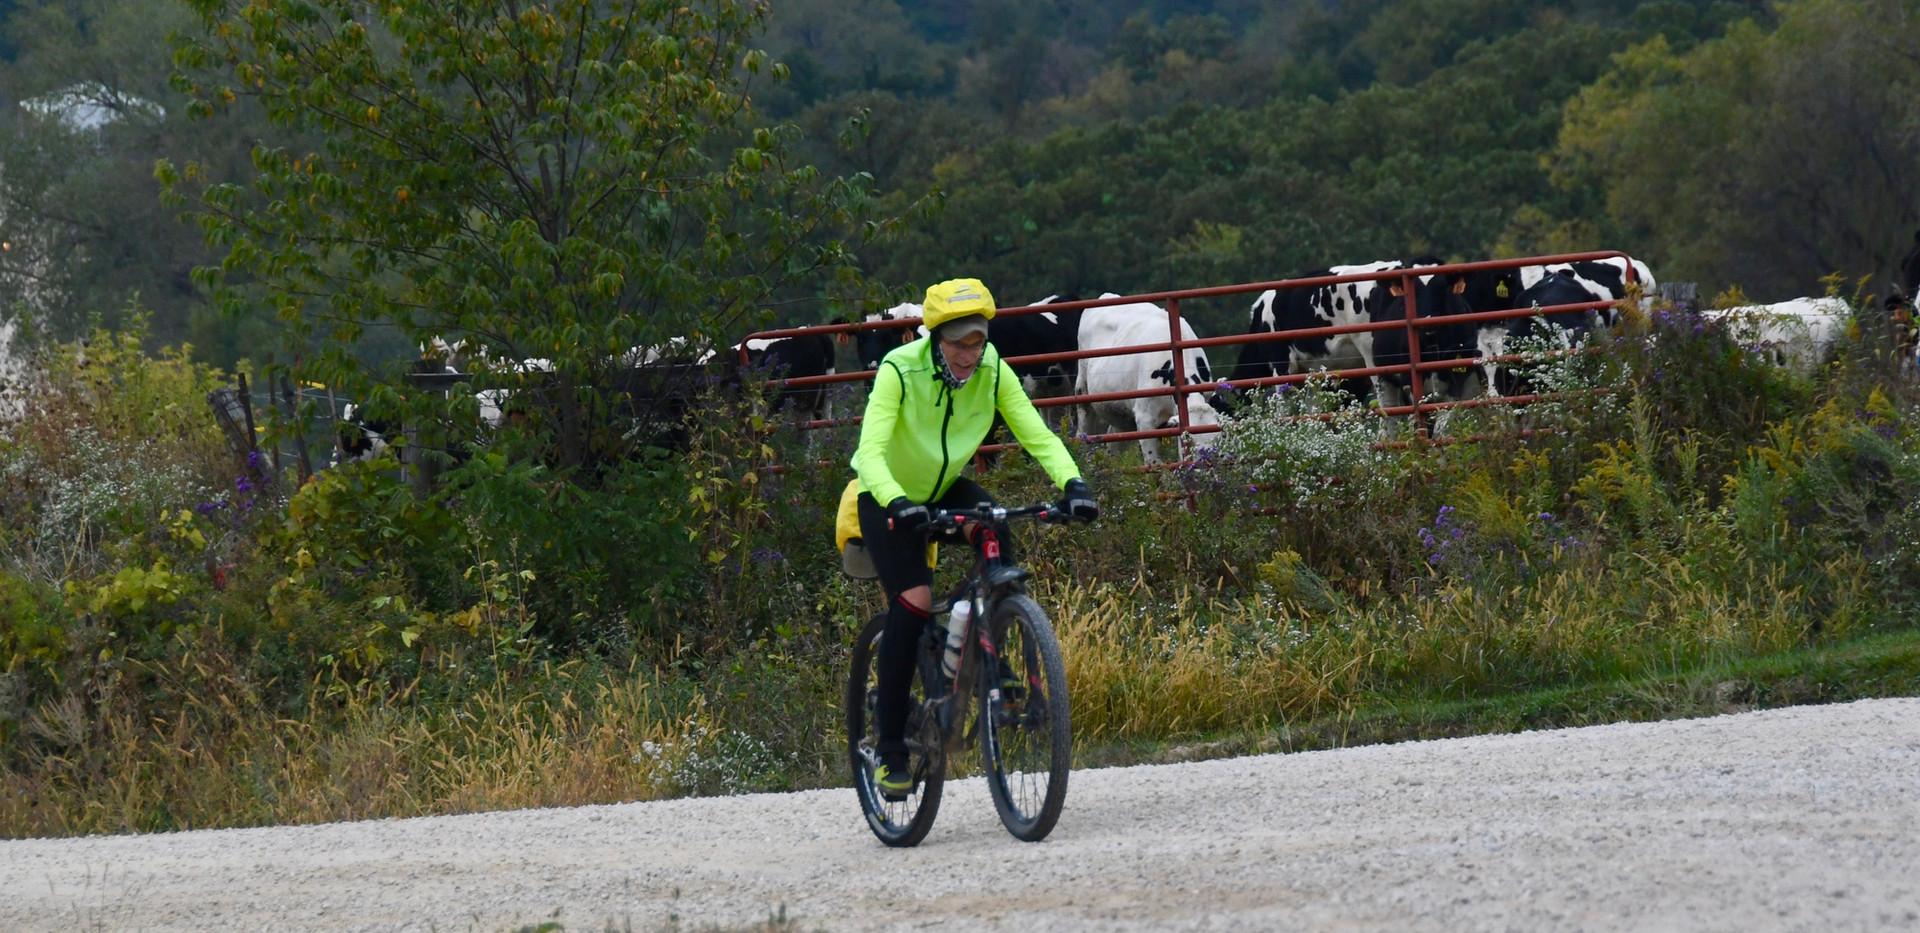 biker and cows.jpg